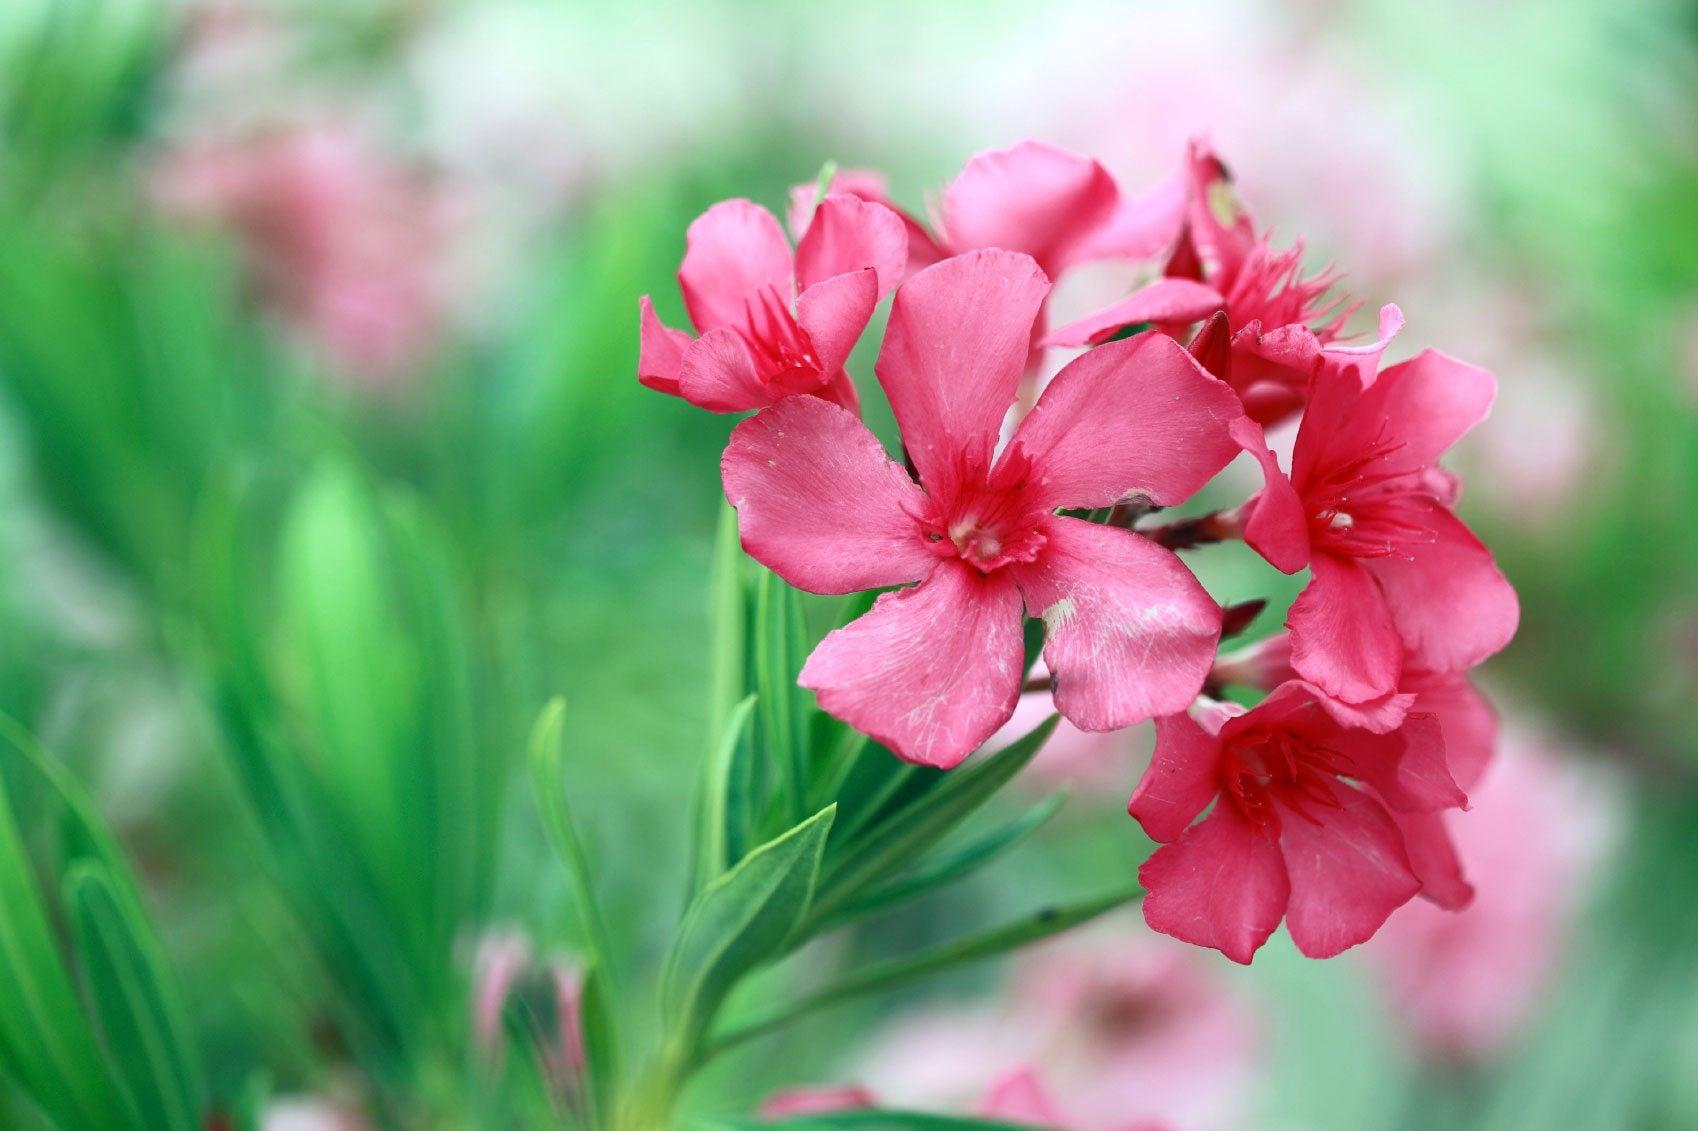 Oleander Plant Info - How To Care For Oleander Shrubs